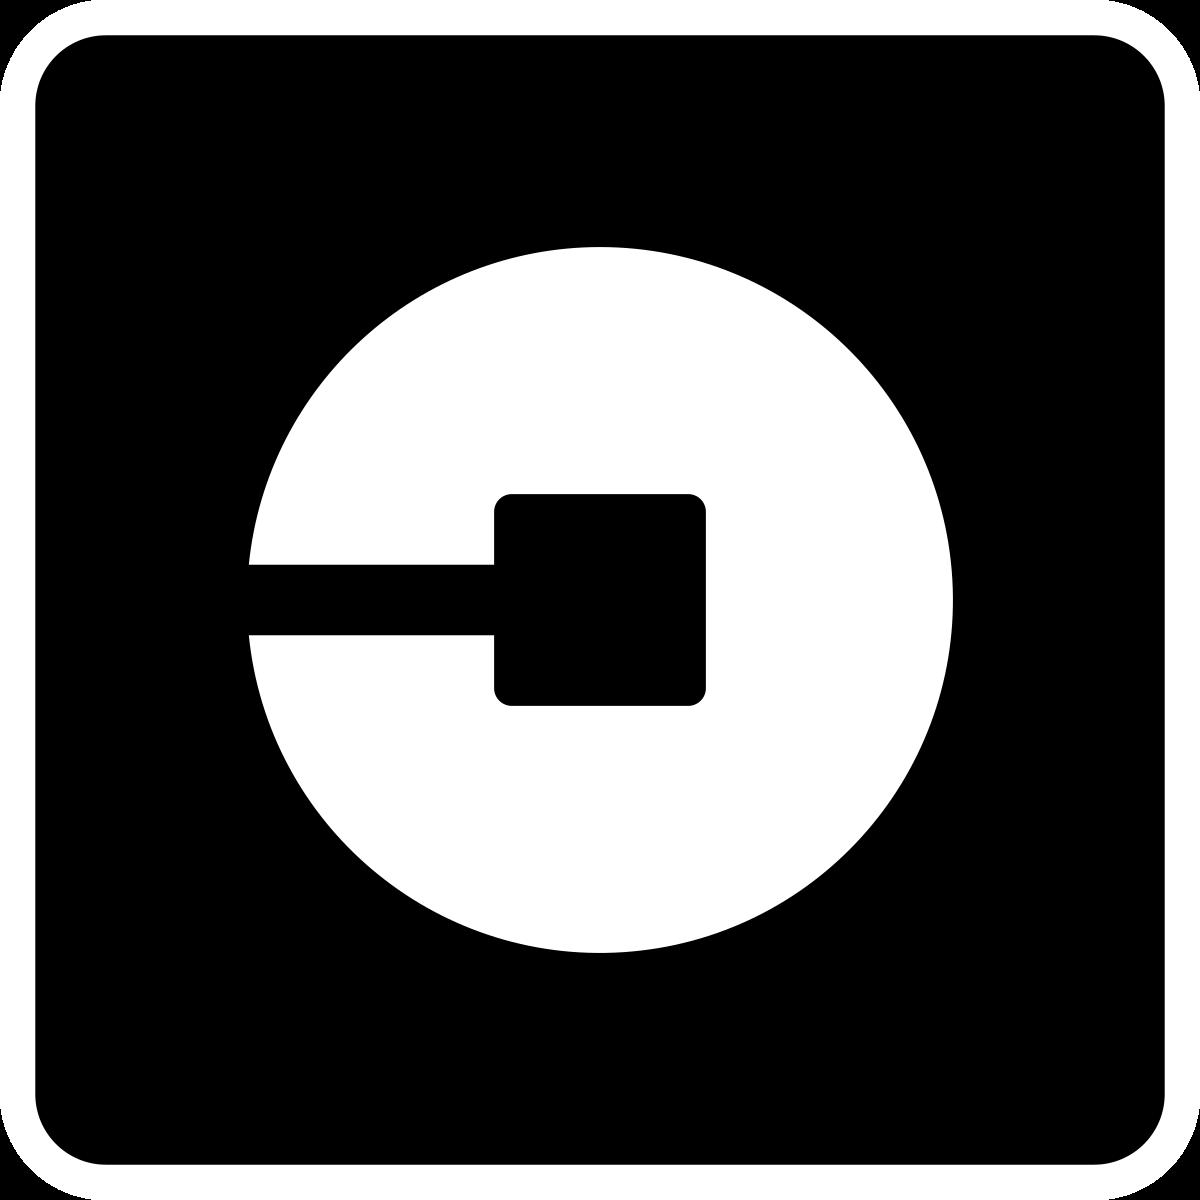 Uber app logos